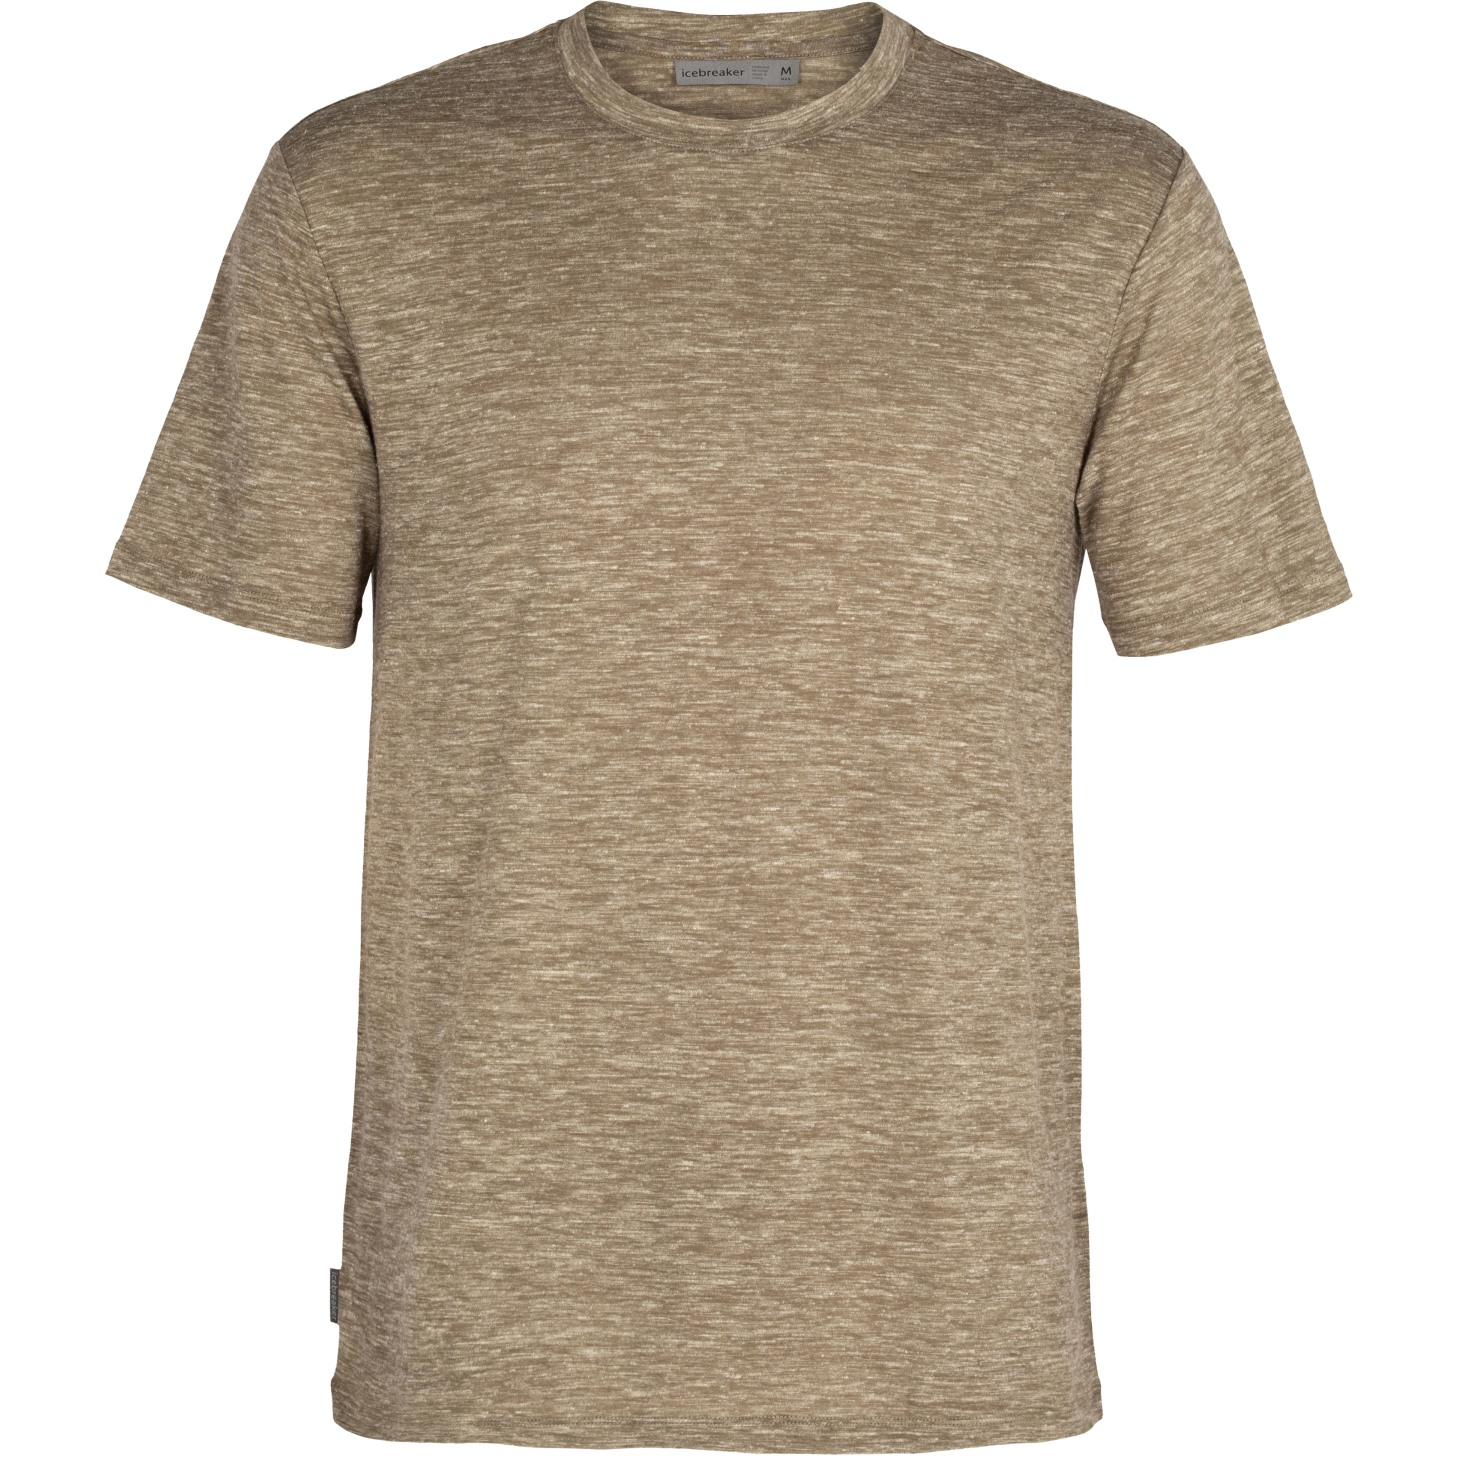 Produktbild von Icebreaker Dowlas Crewe Herren T-Shirt - Flint